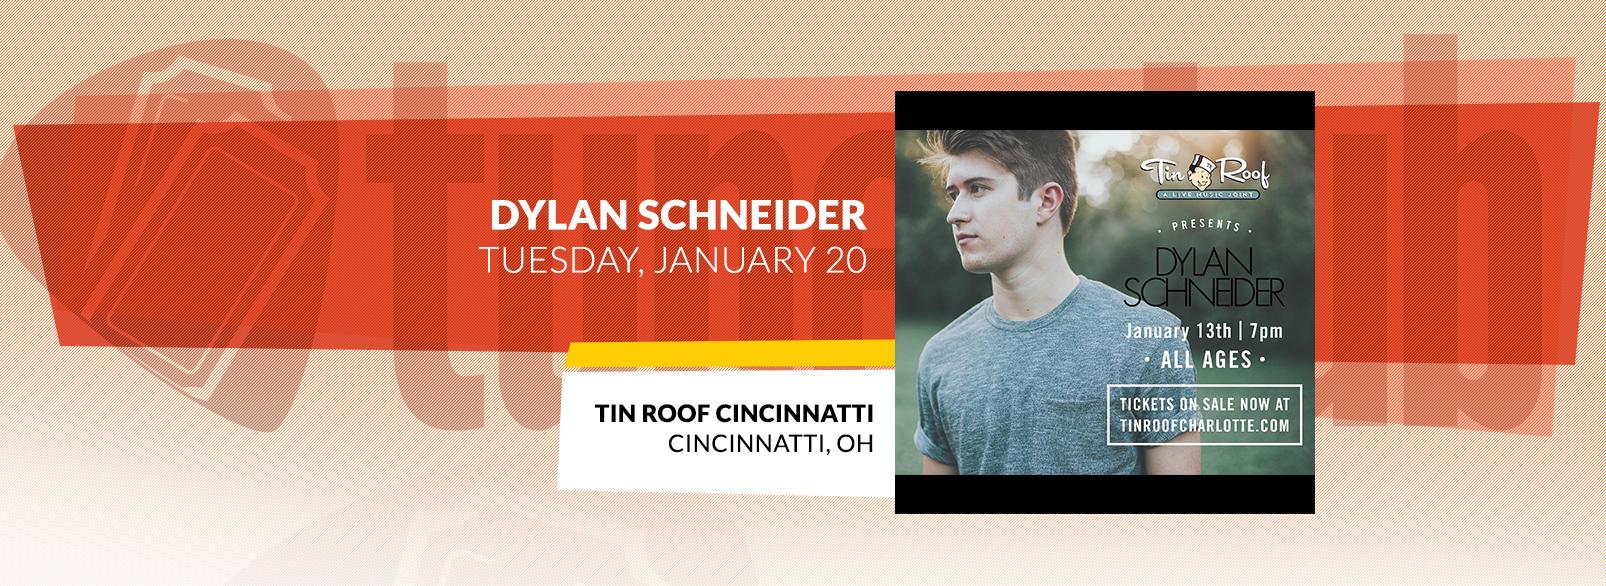 Dylan Schneider @ Tin Roof Cincinnati